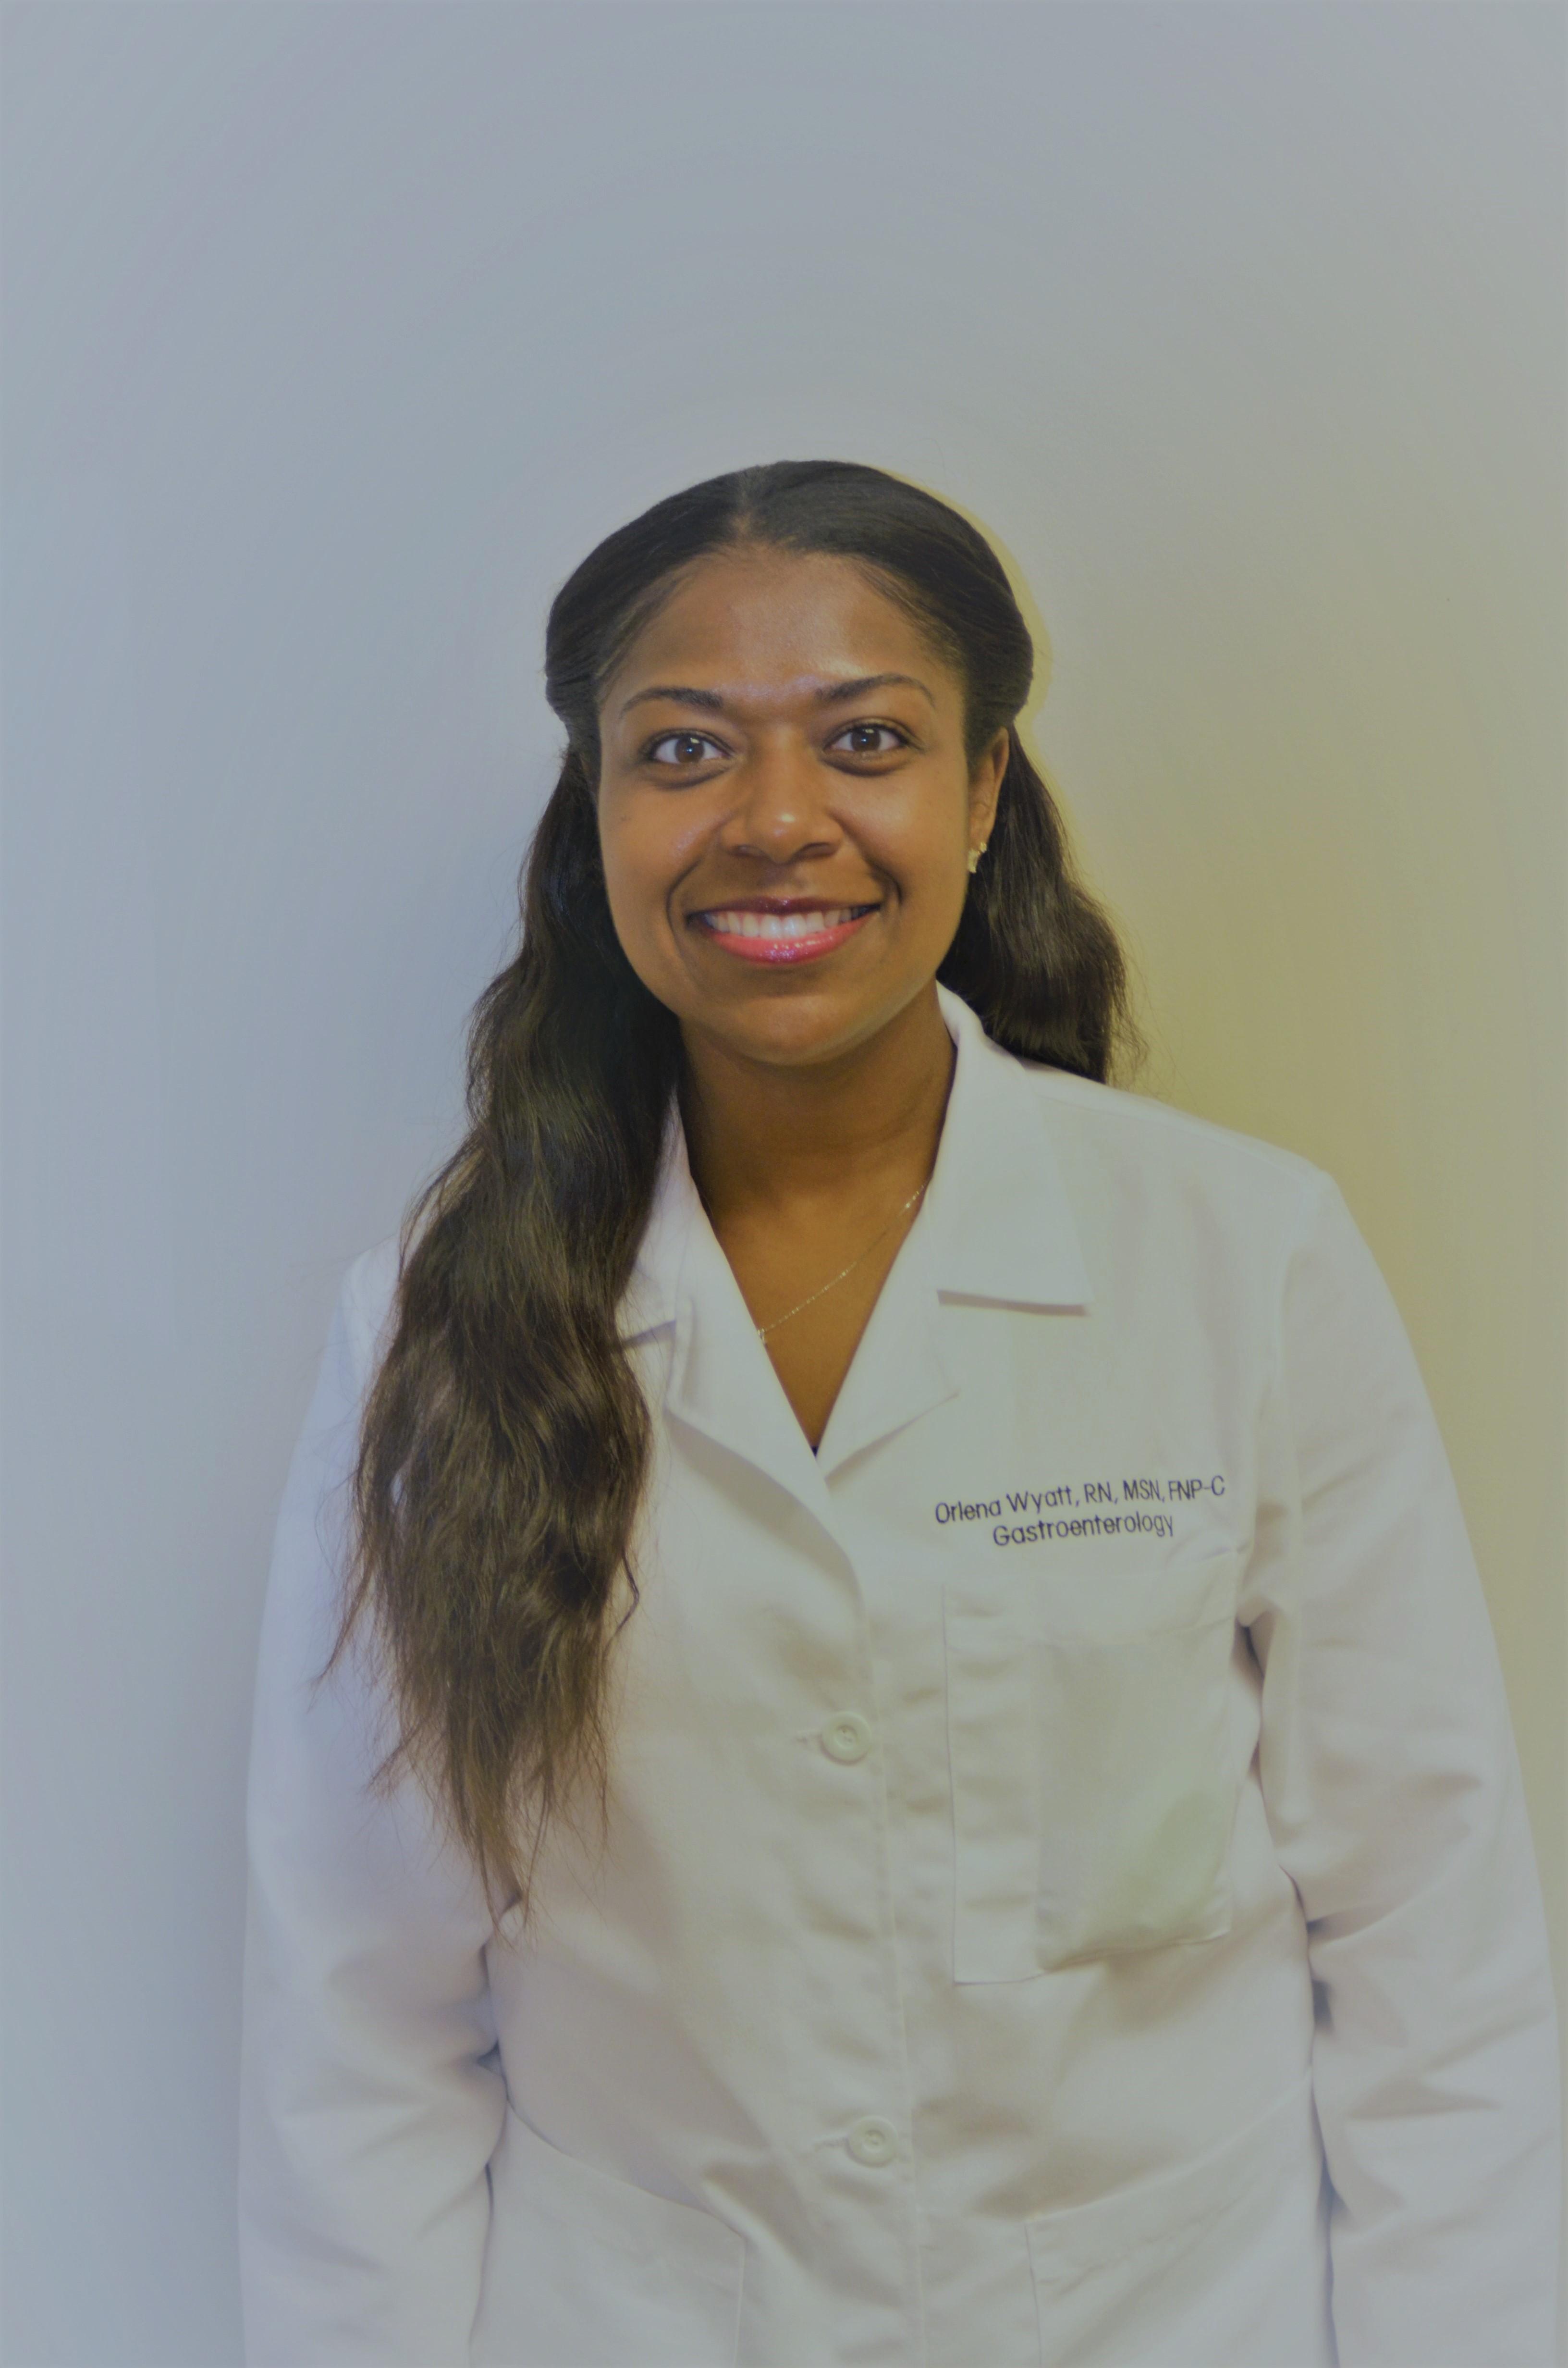 Family Nurse Practitioner Orlena Wyatt